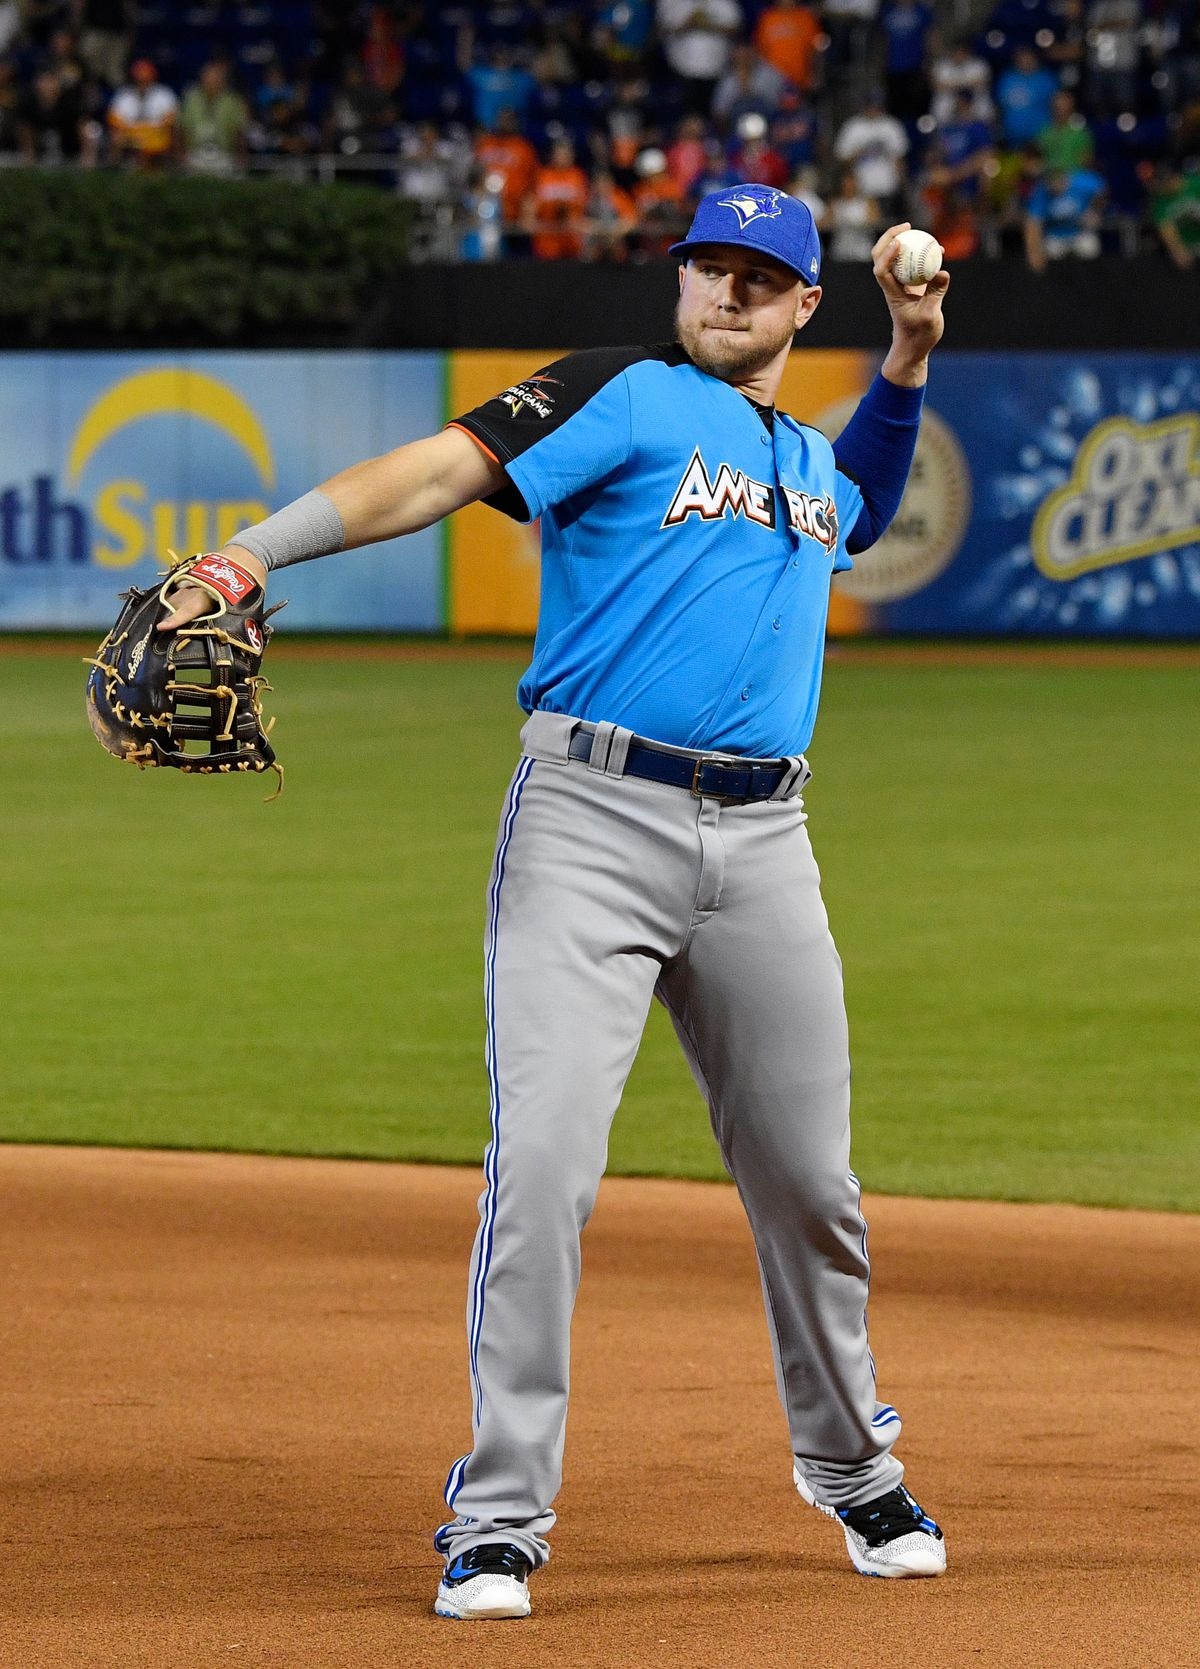 88th MLB All-Star Game - Batting Practice